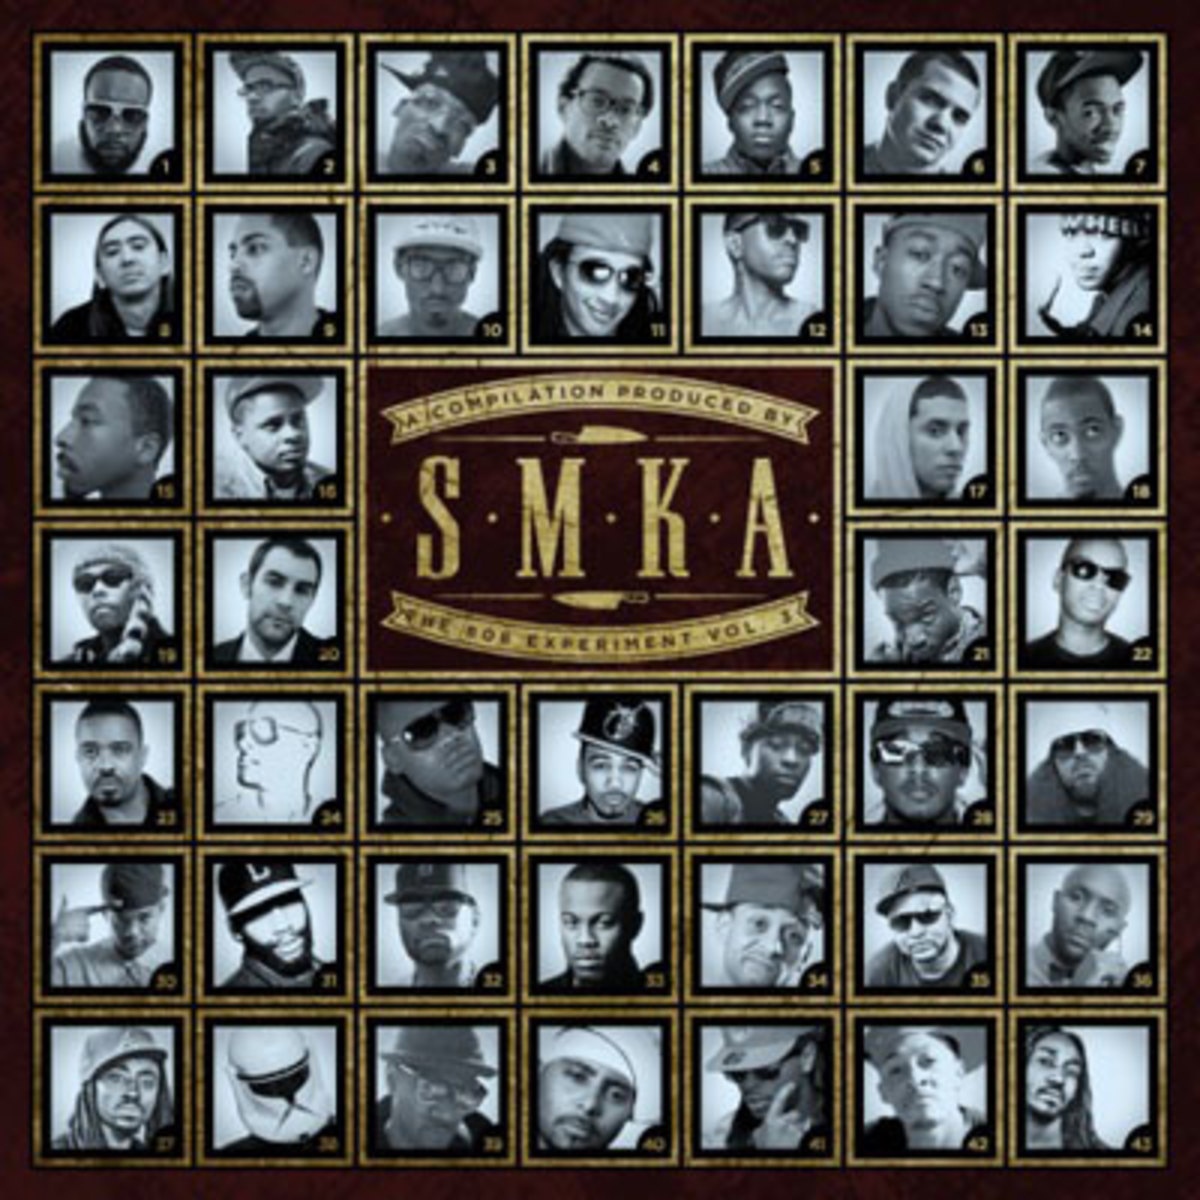 smka-vol3-cover.jpg